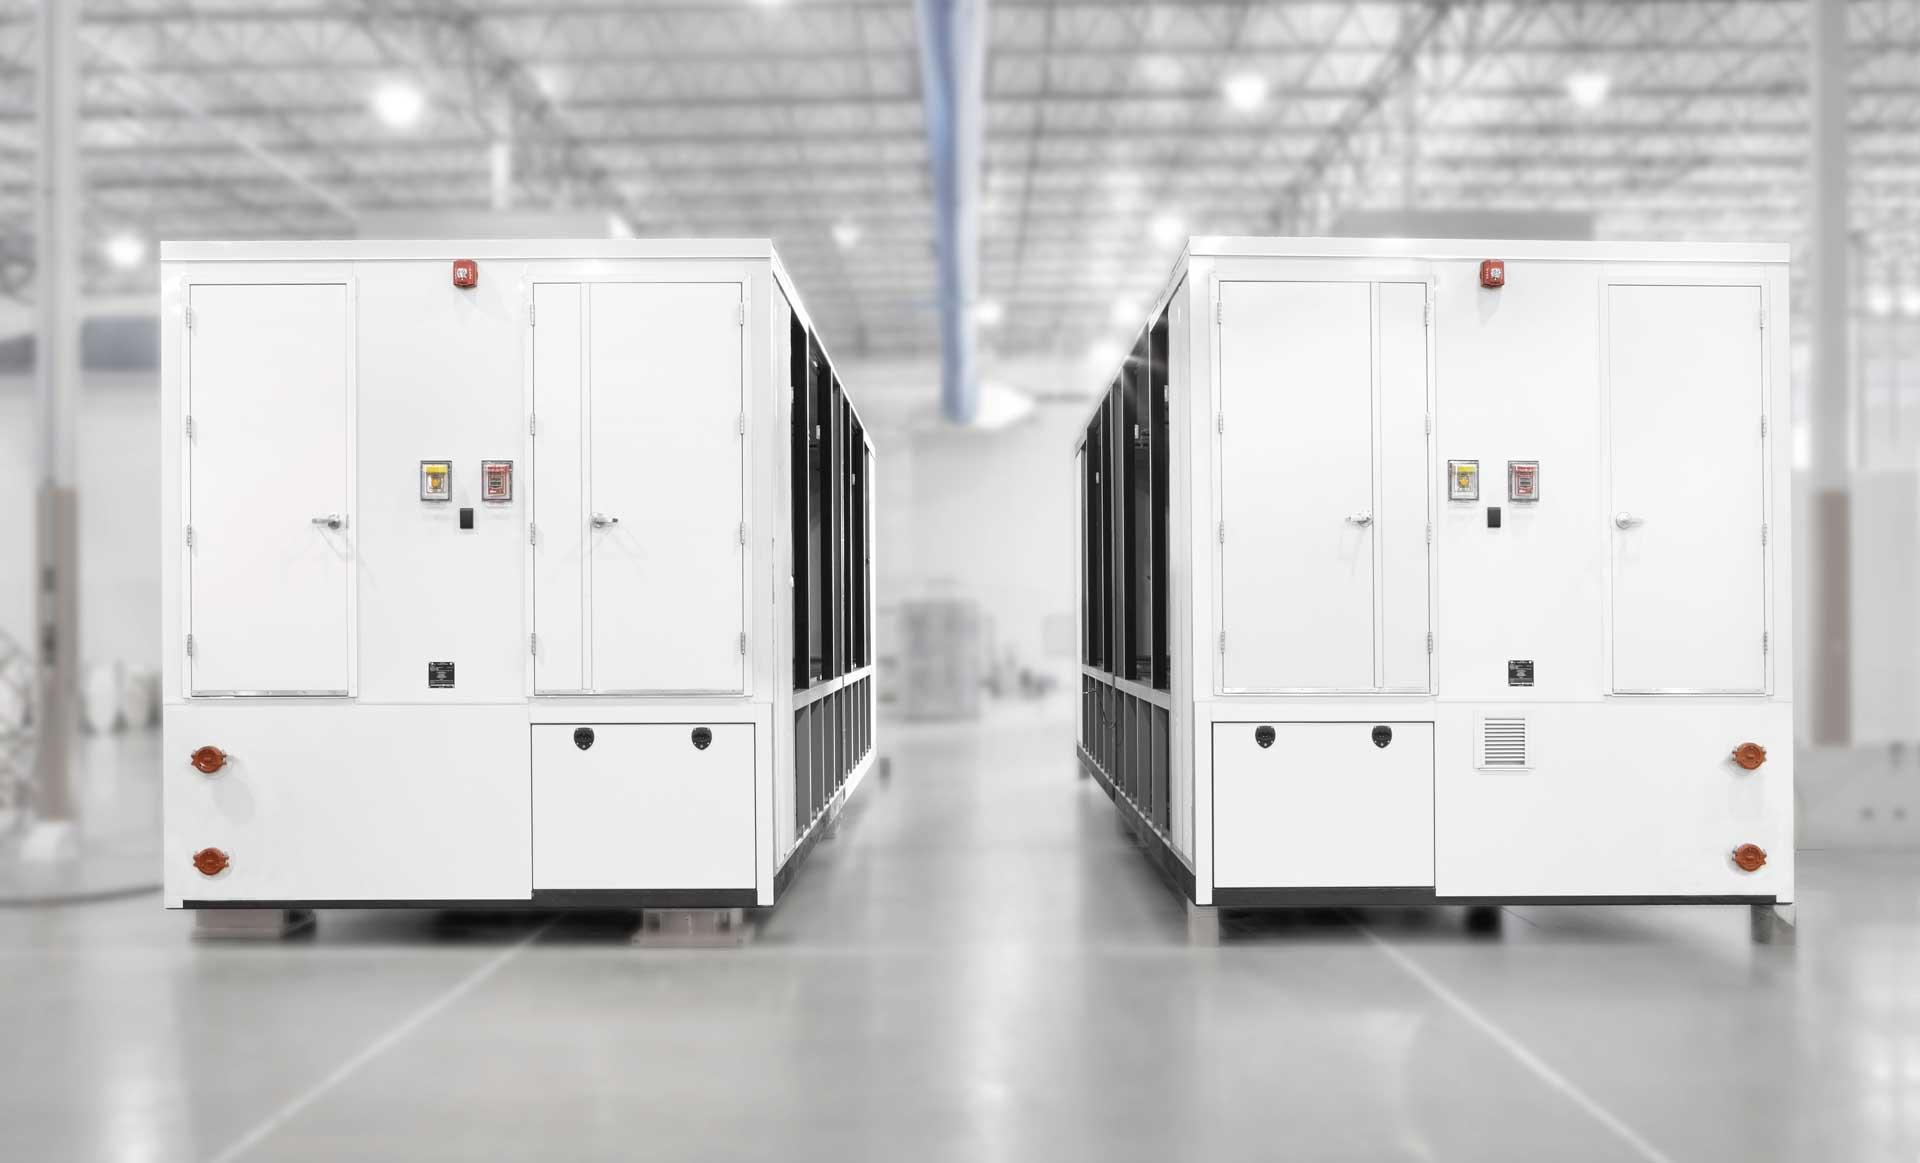 Modular Data Center Infrastructure Baselayer Core